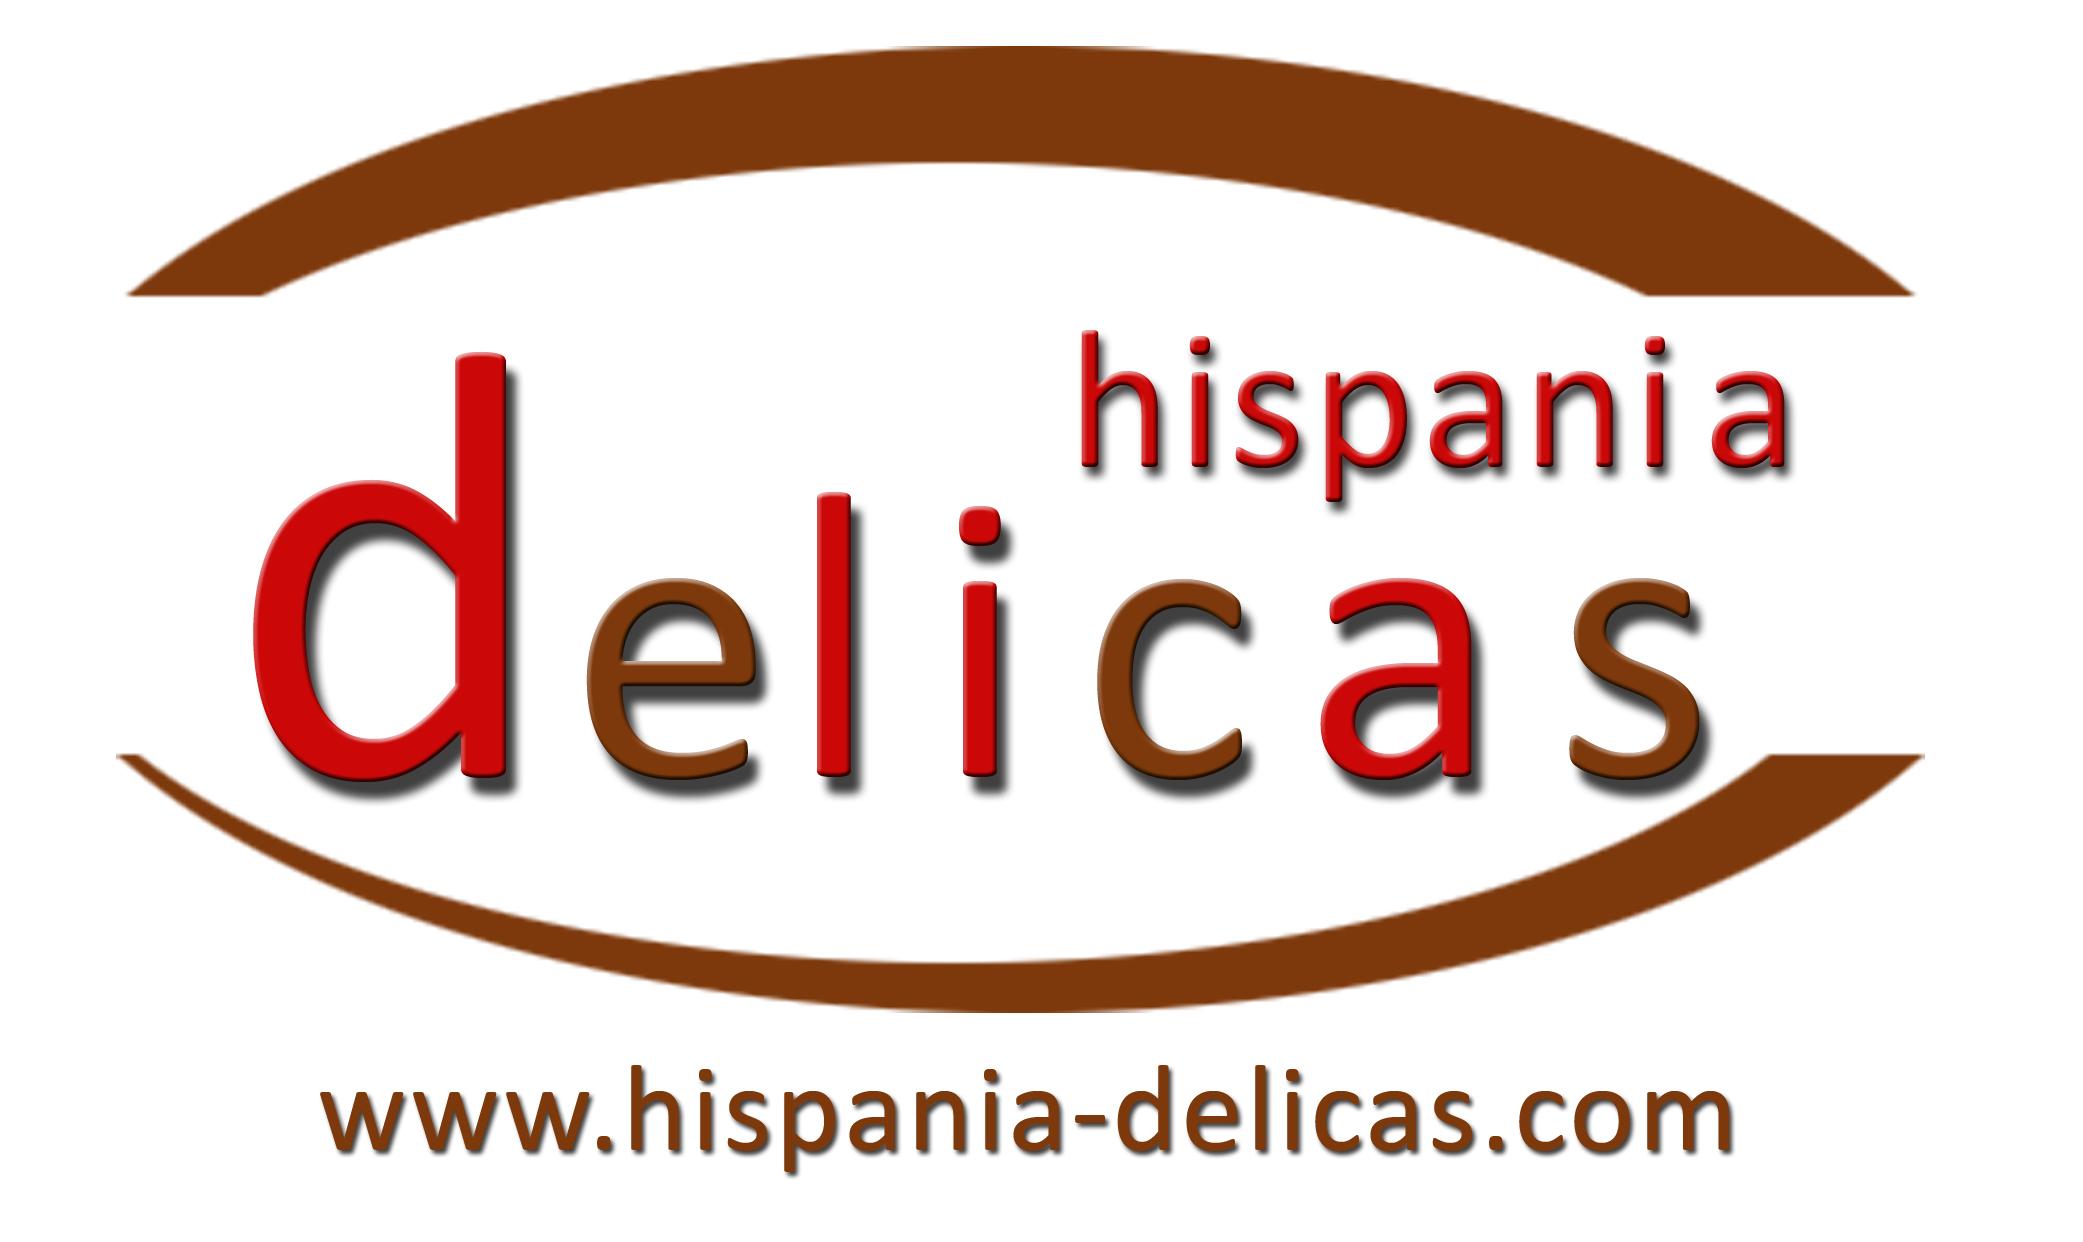 hispaniadelicas